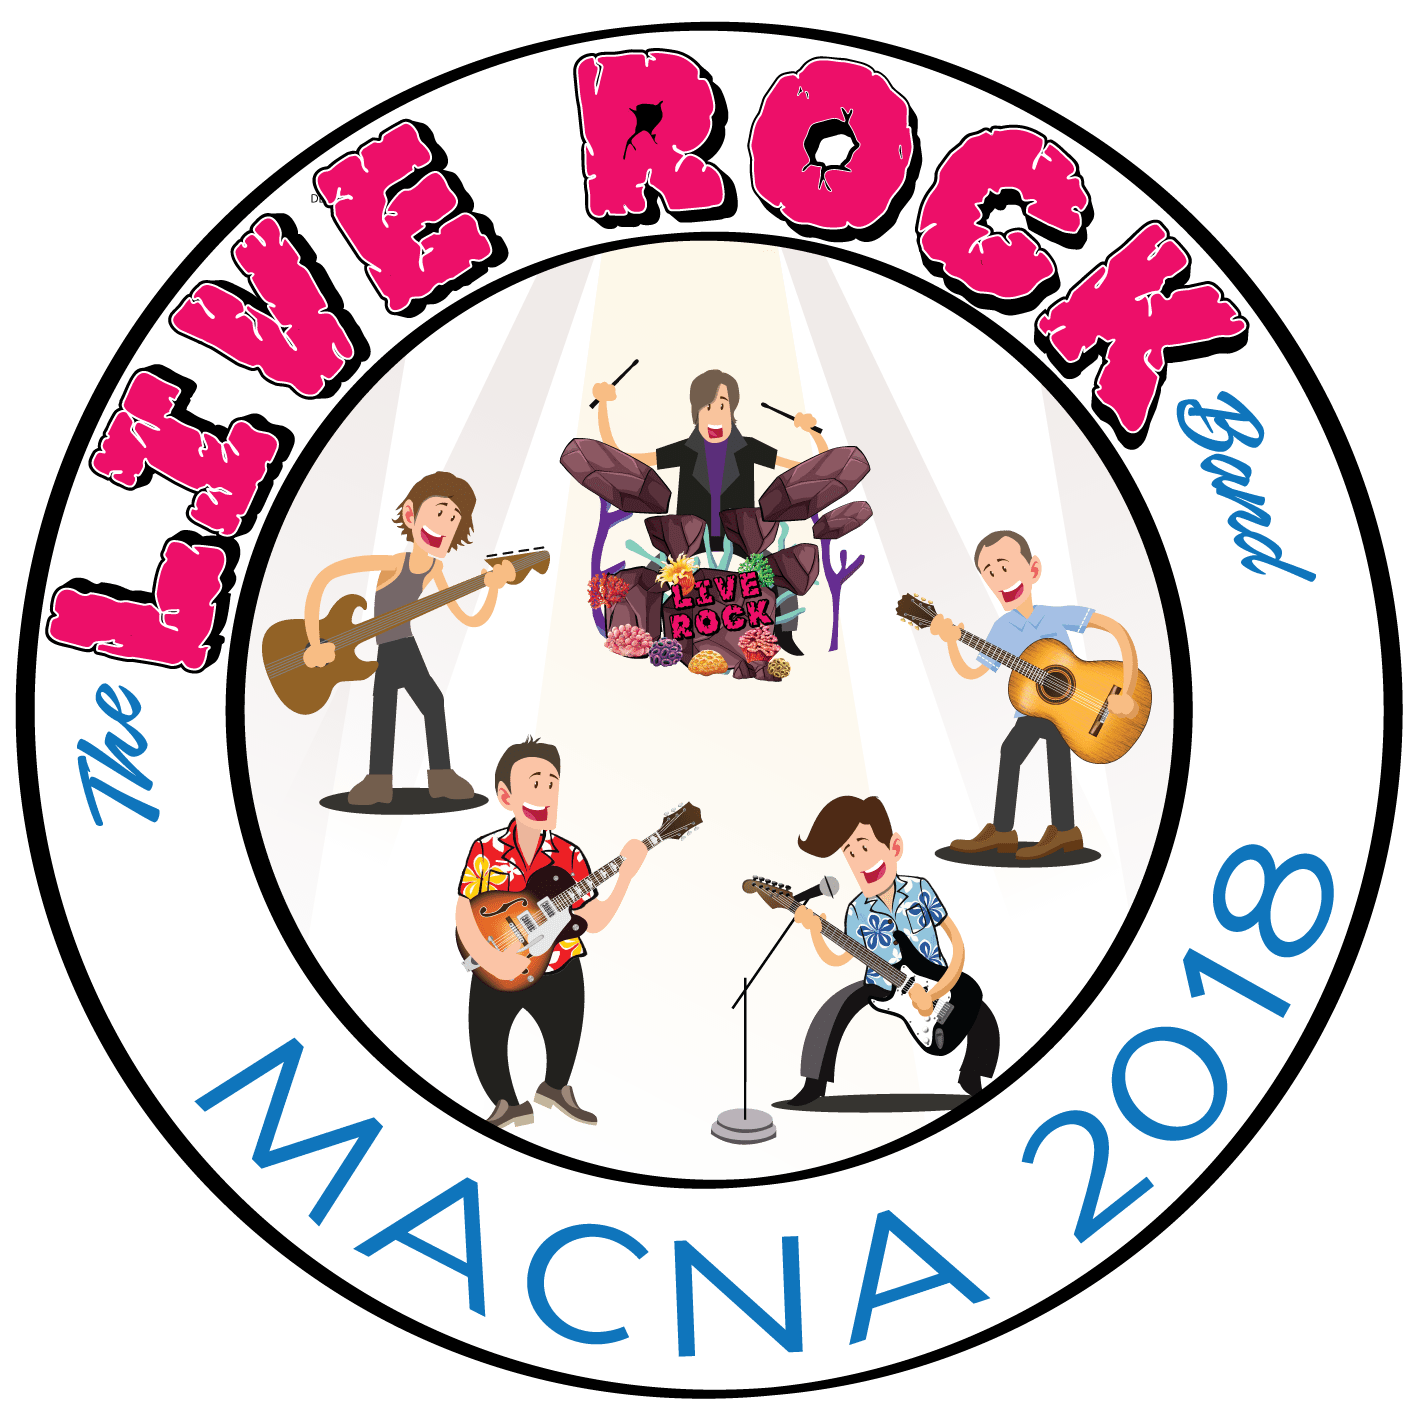 Live Rock Band MACNA 2018 Logo